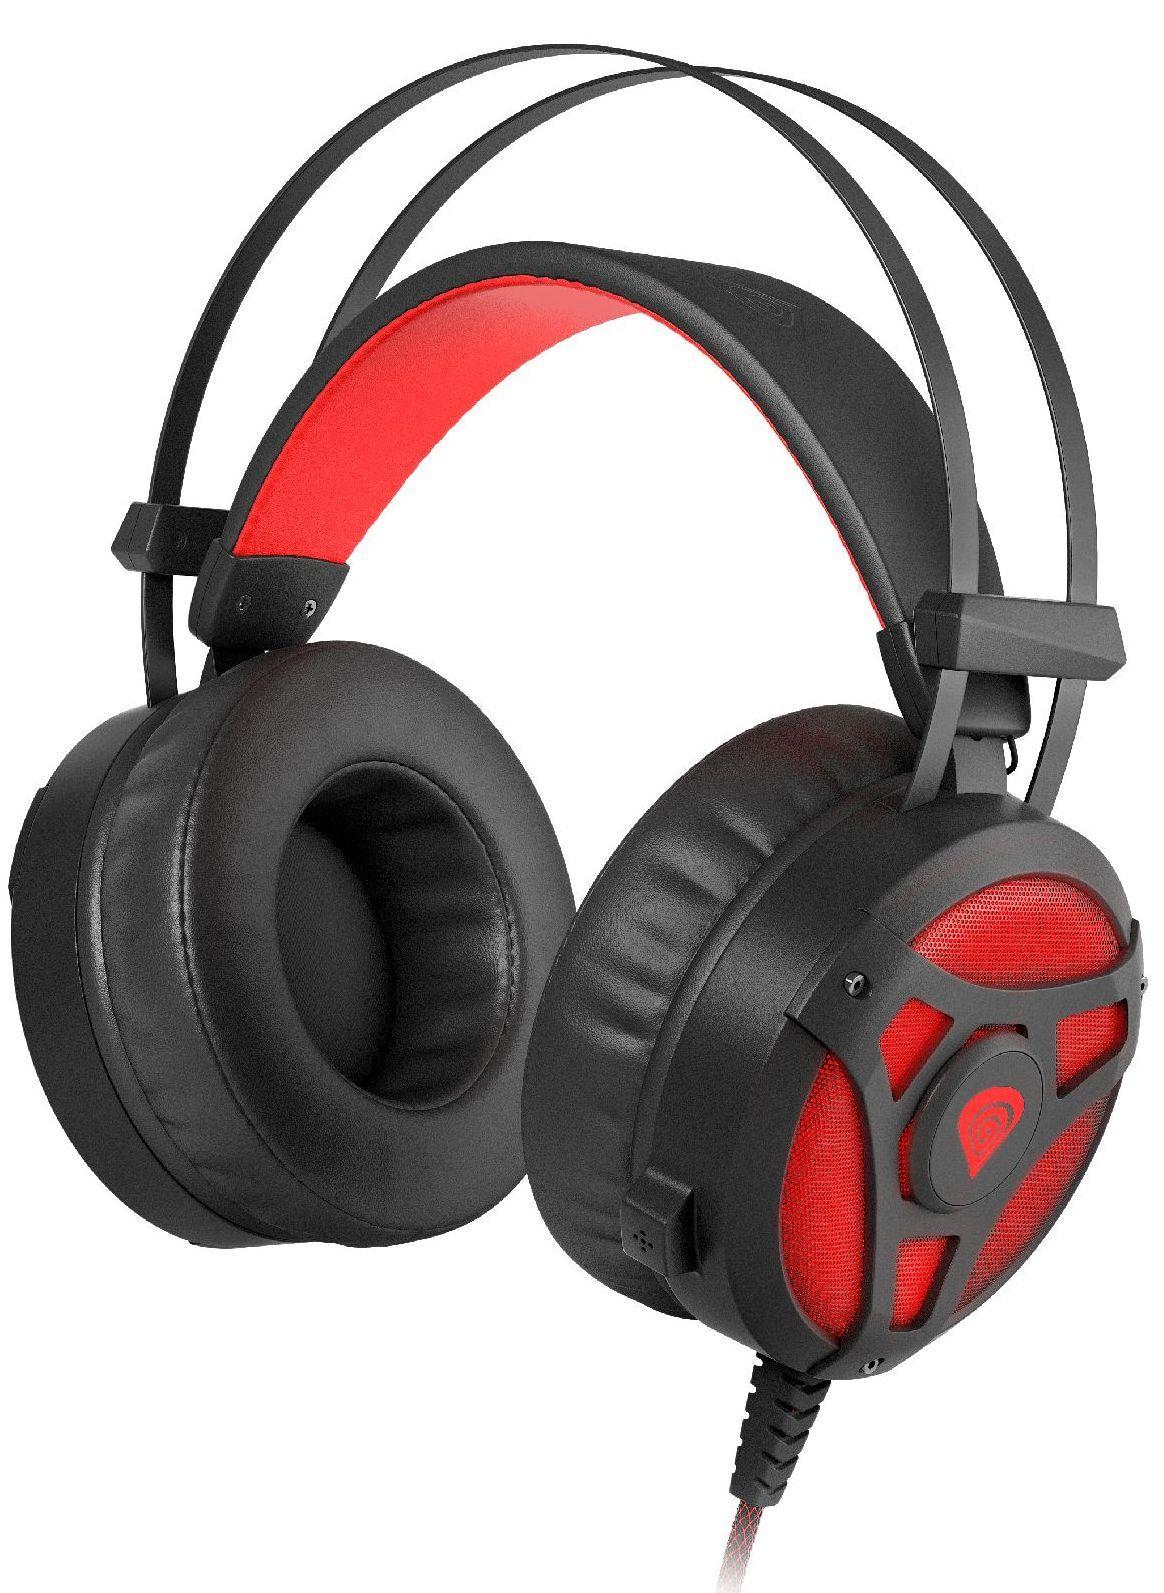 Гейминг слушалки Genesis Neon 360 - черни/червени - 1